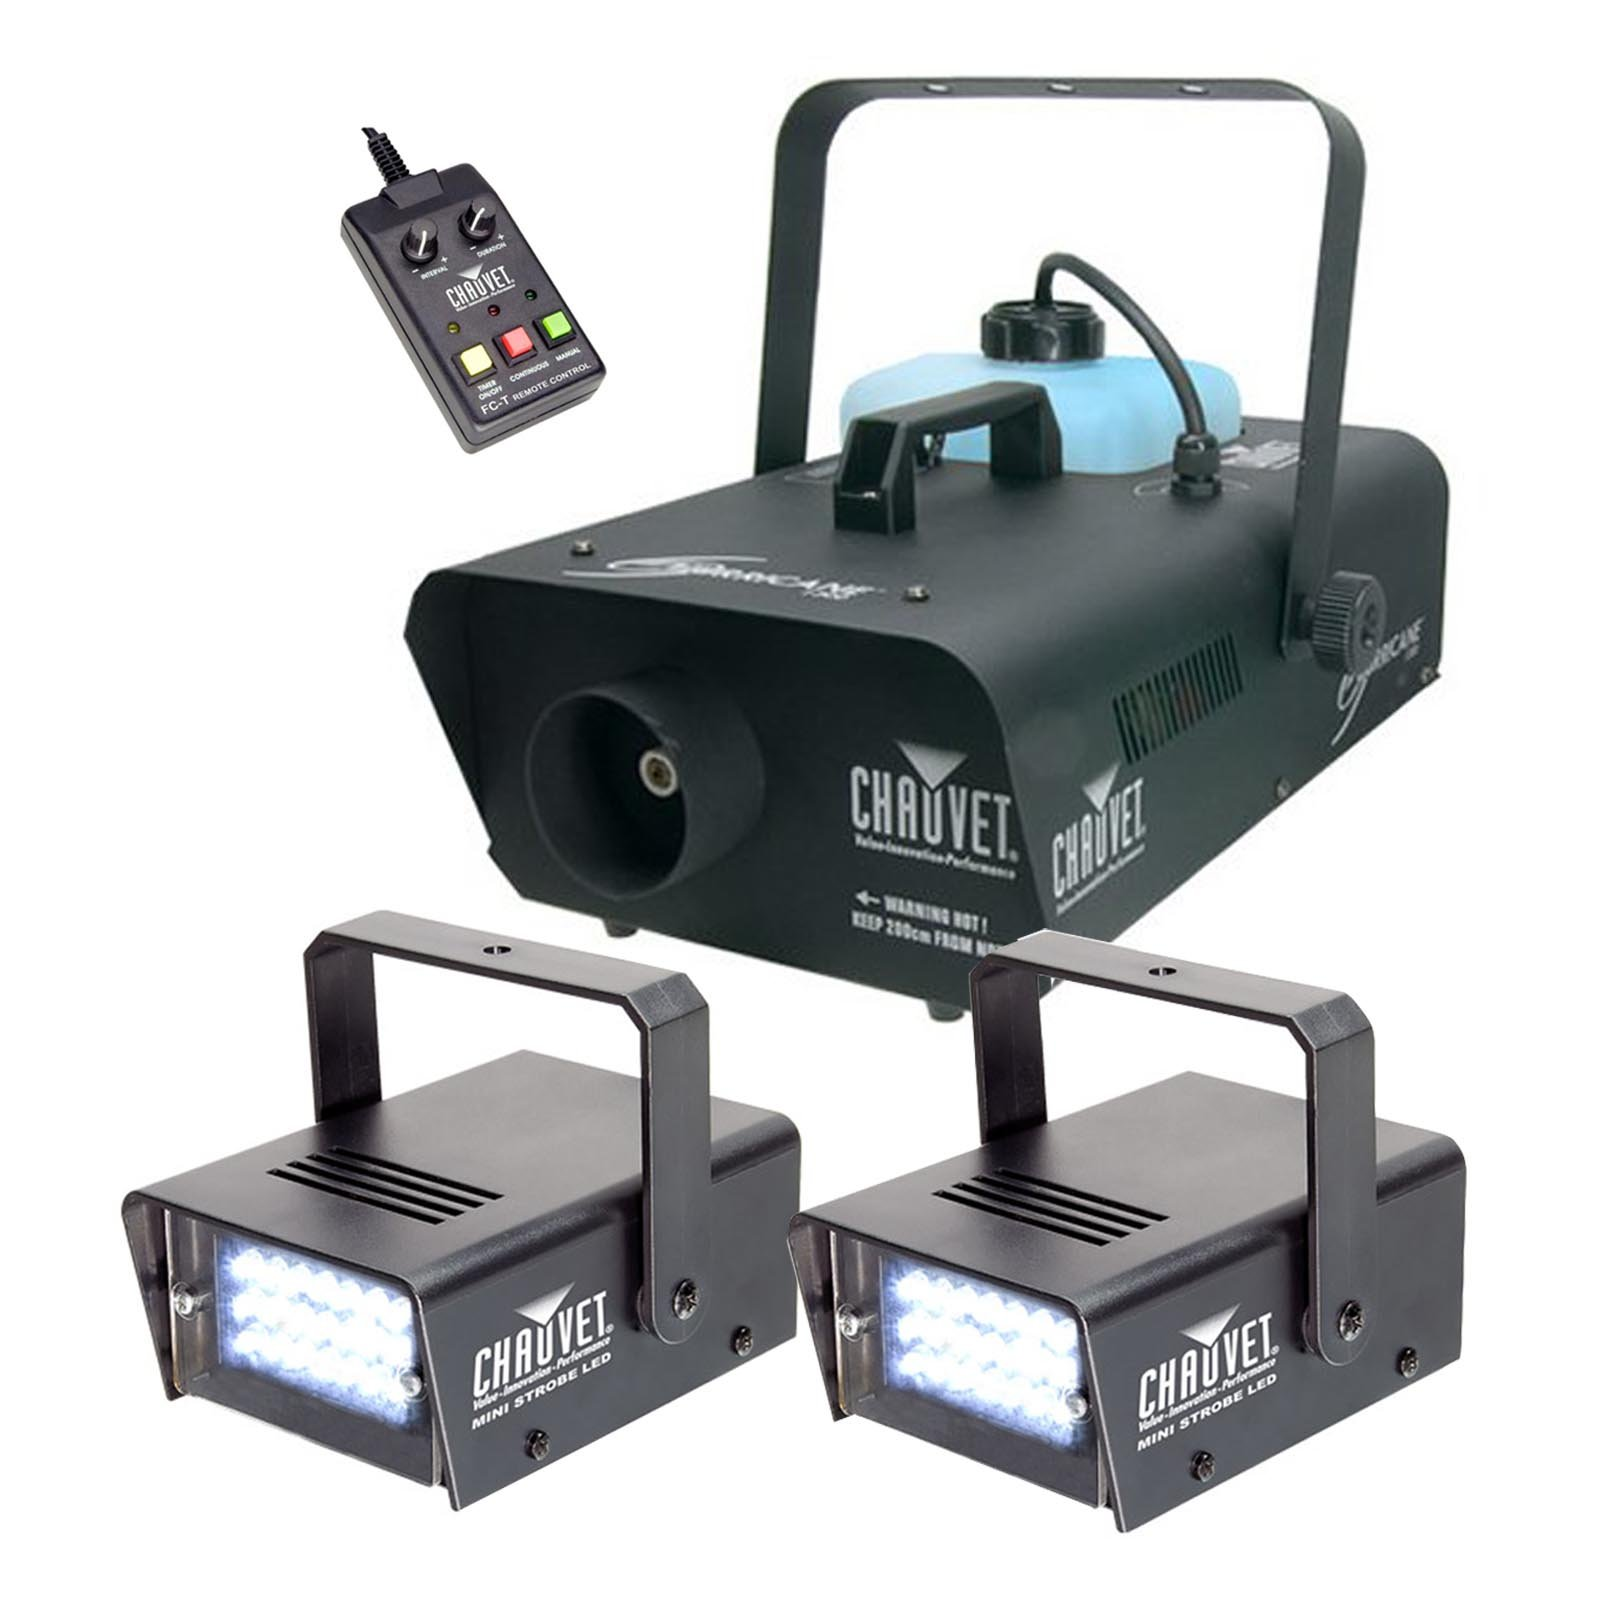 (2) CHAUVET LED Mini Strobe Lights + Hurricane H1300 Smoke Fog Machine w/ Remote by CHAUVET DJ